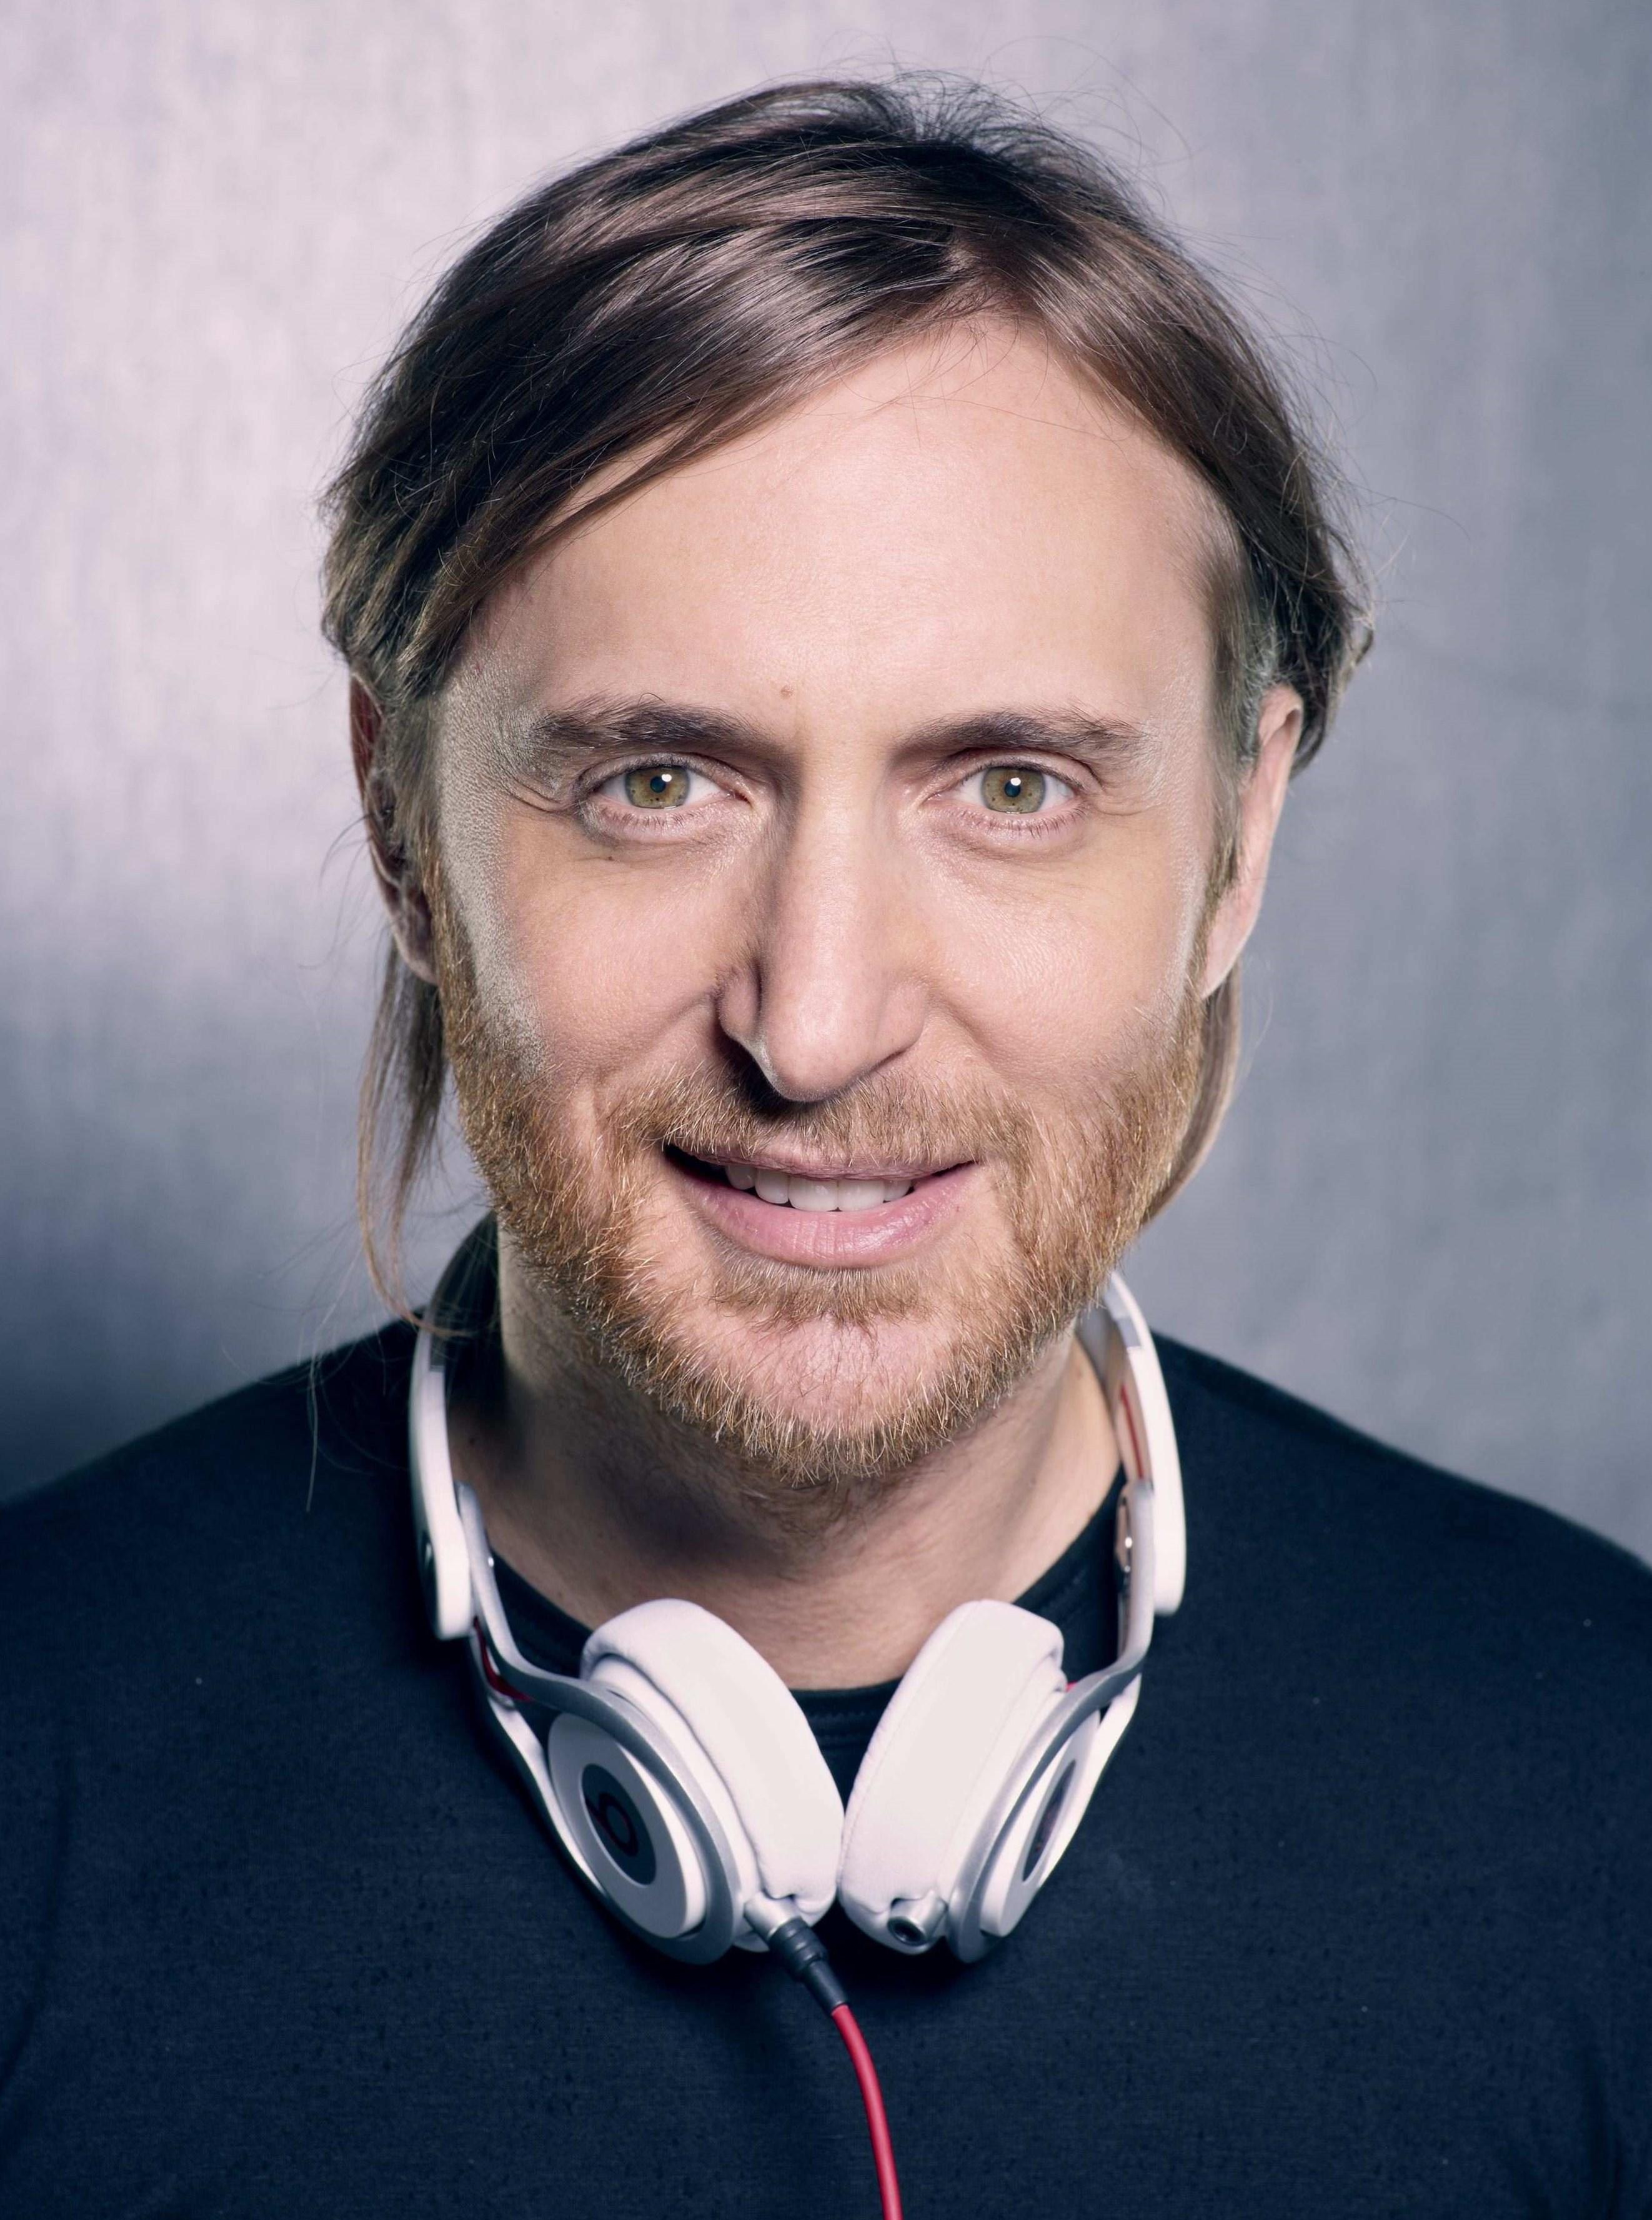 David Lee Basketball >> David Guetta Celebrity Net Worth - Salary, House, Car